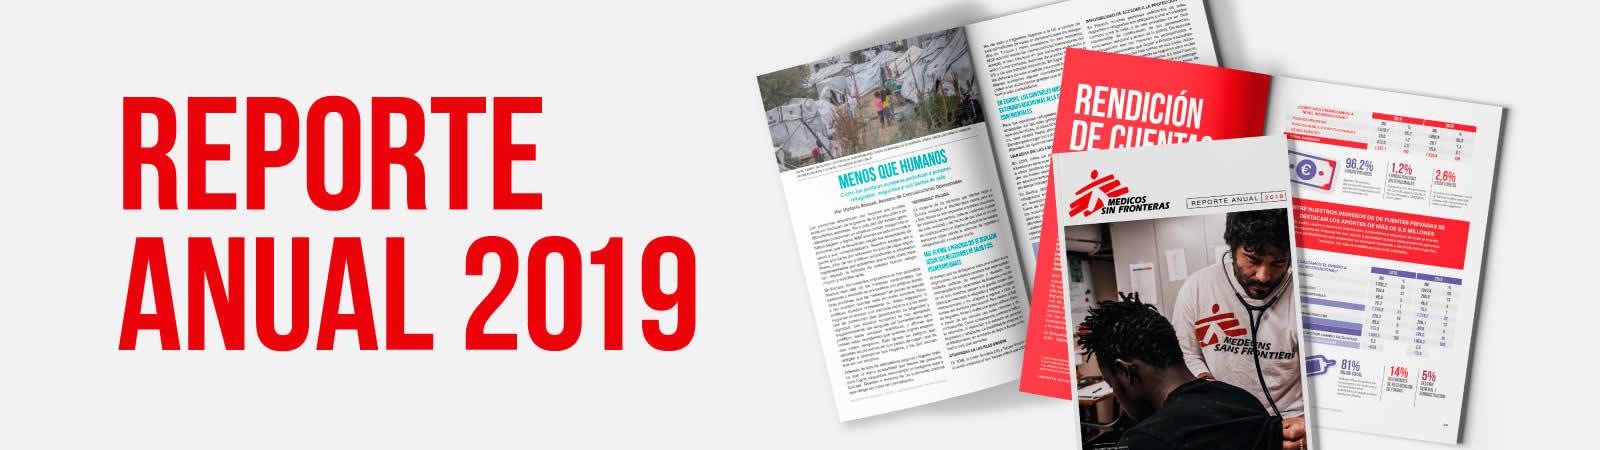 Reporte Anual 2019